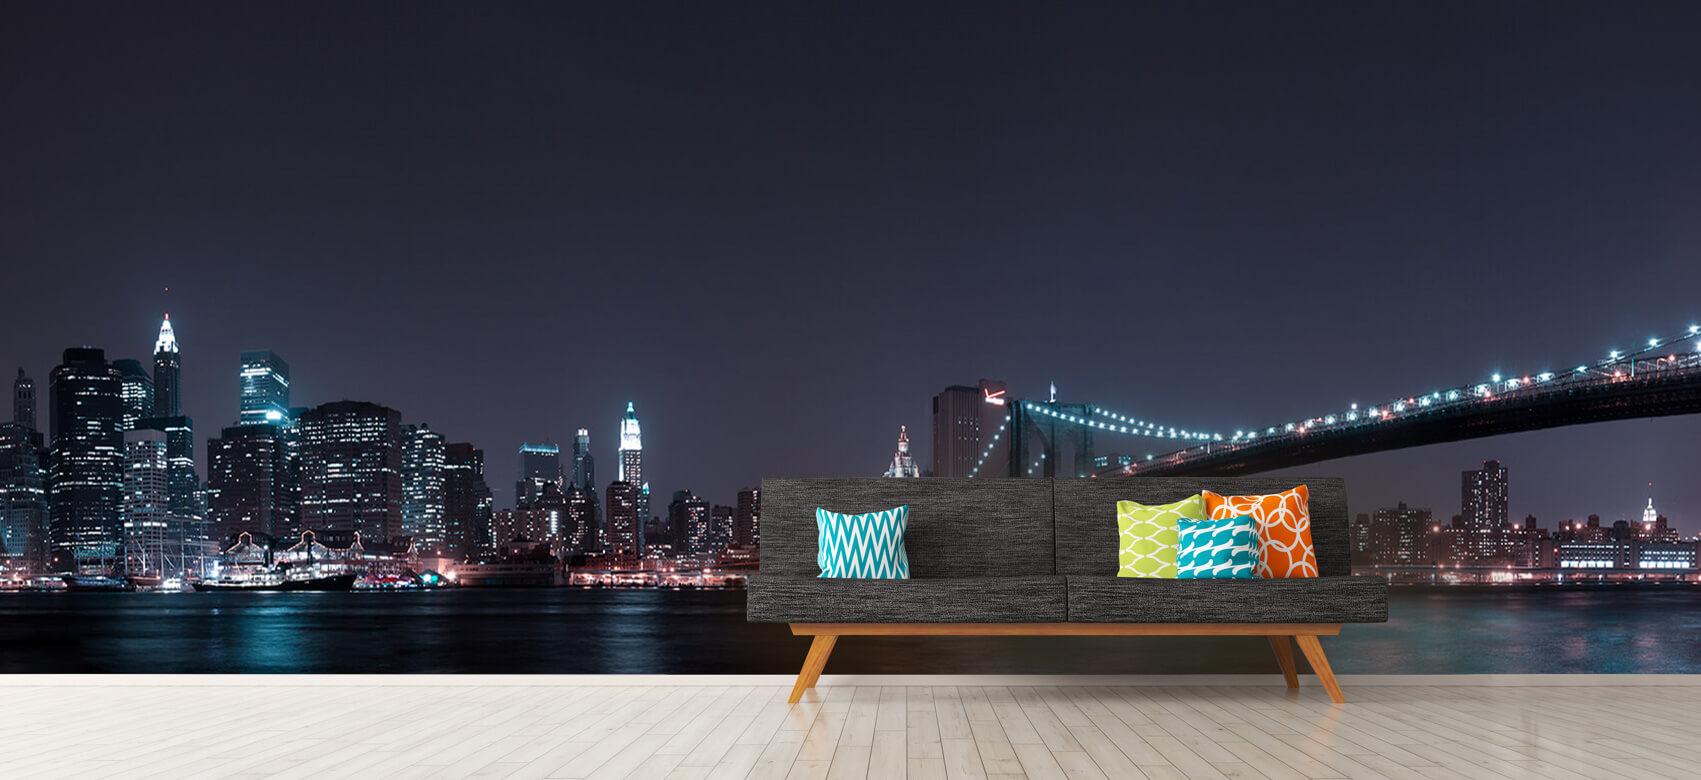 Nacht Manhattan Skyline and Brooklyn Bridge 12